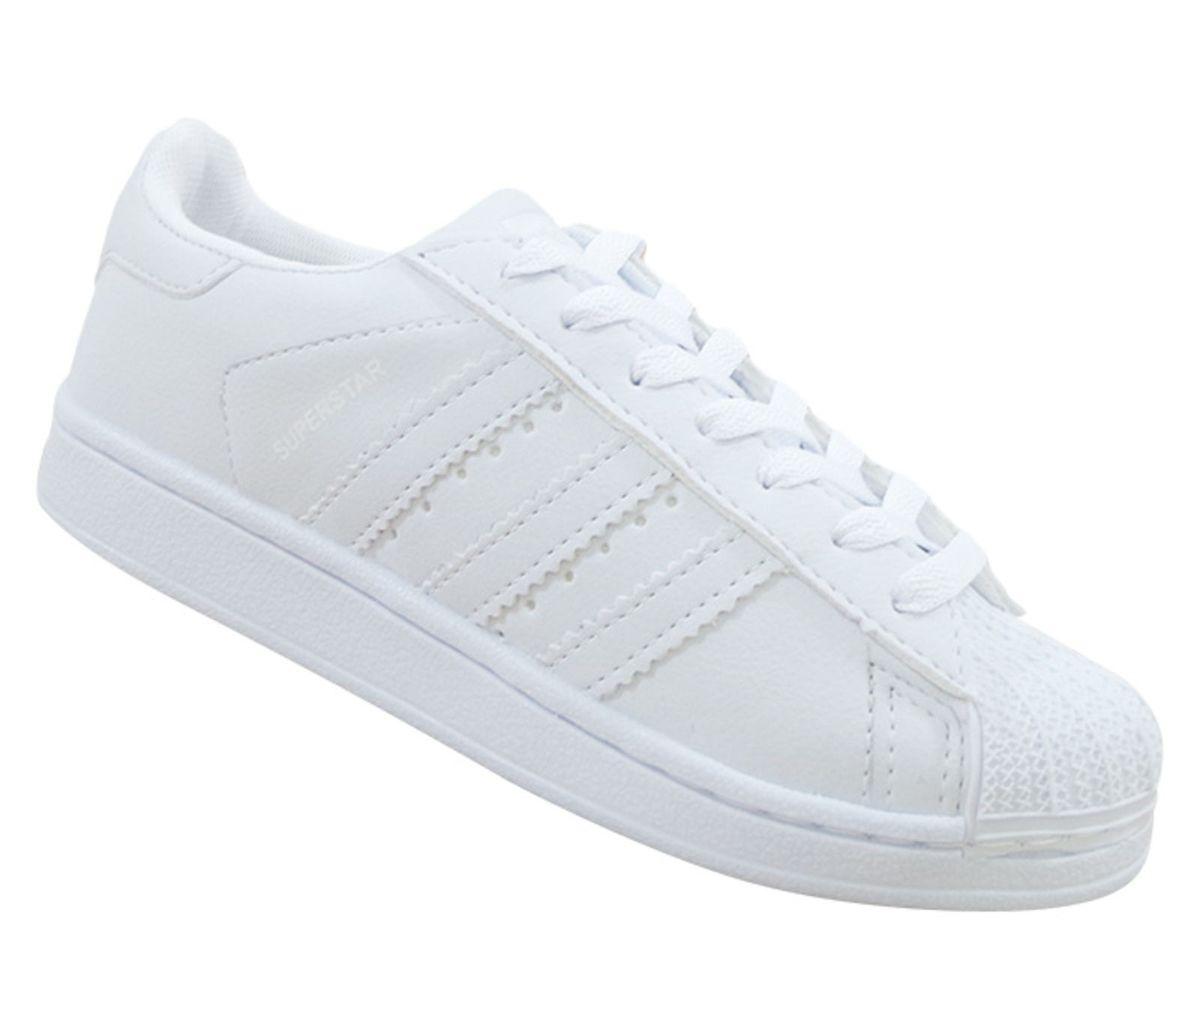 4a5f67227b229 tênis adidas superstar branco - tênis adidas.  Czm6ly9wag90b3muzw5qb2vplmnvbs5ici9wcm9kdwn0cy81ntiznzqvmwjhmty3odaynwezzti4n2m1zdk2zjllzji5ytu0nmquanbn  ...